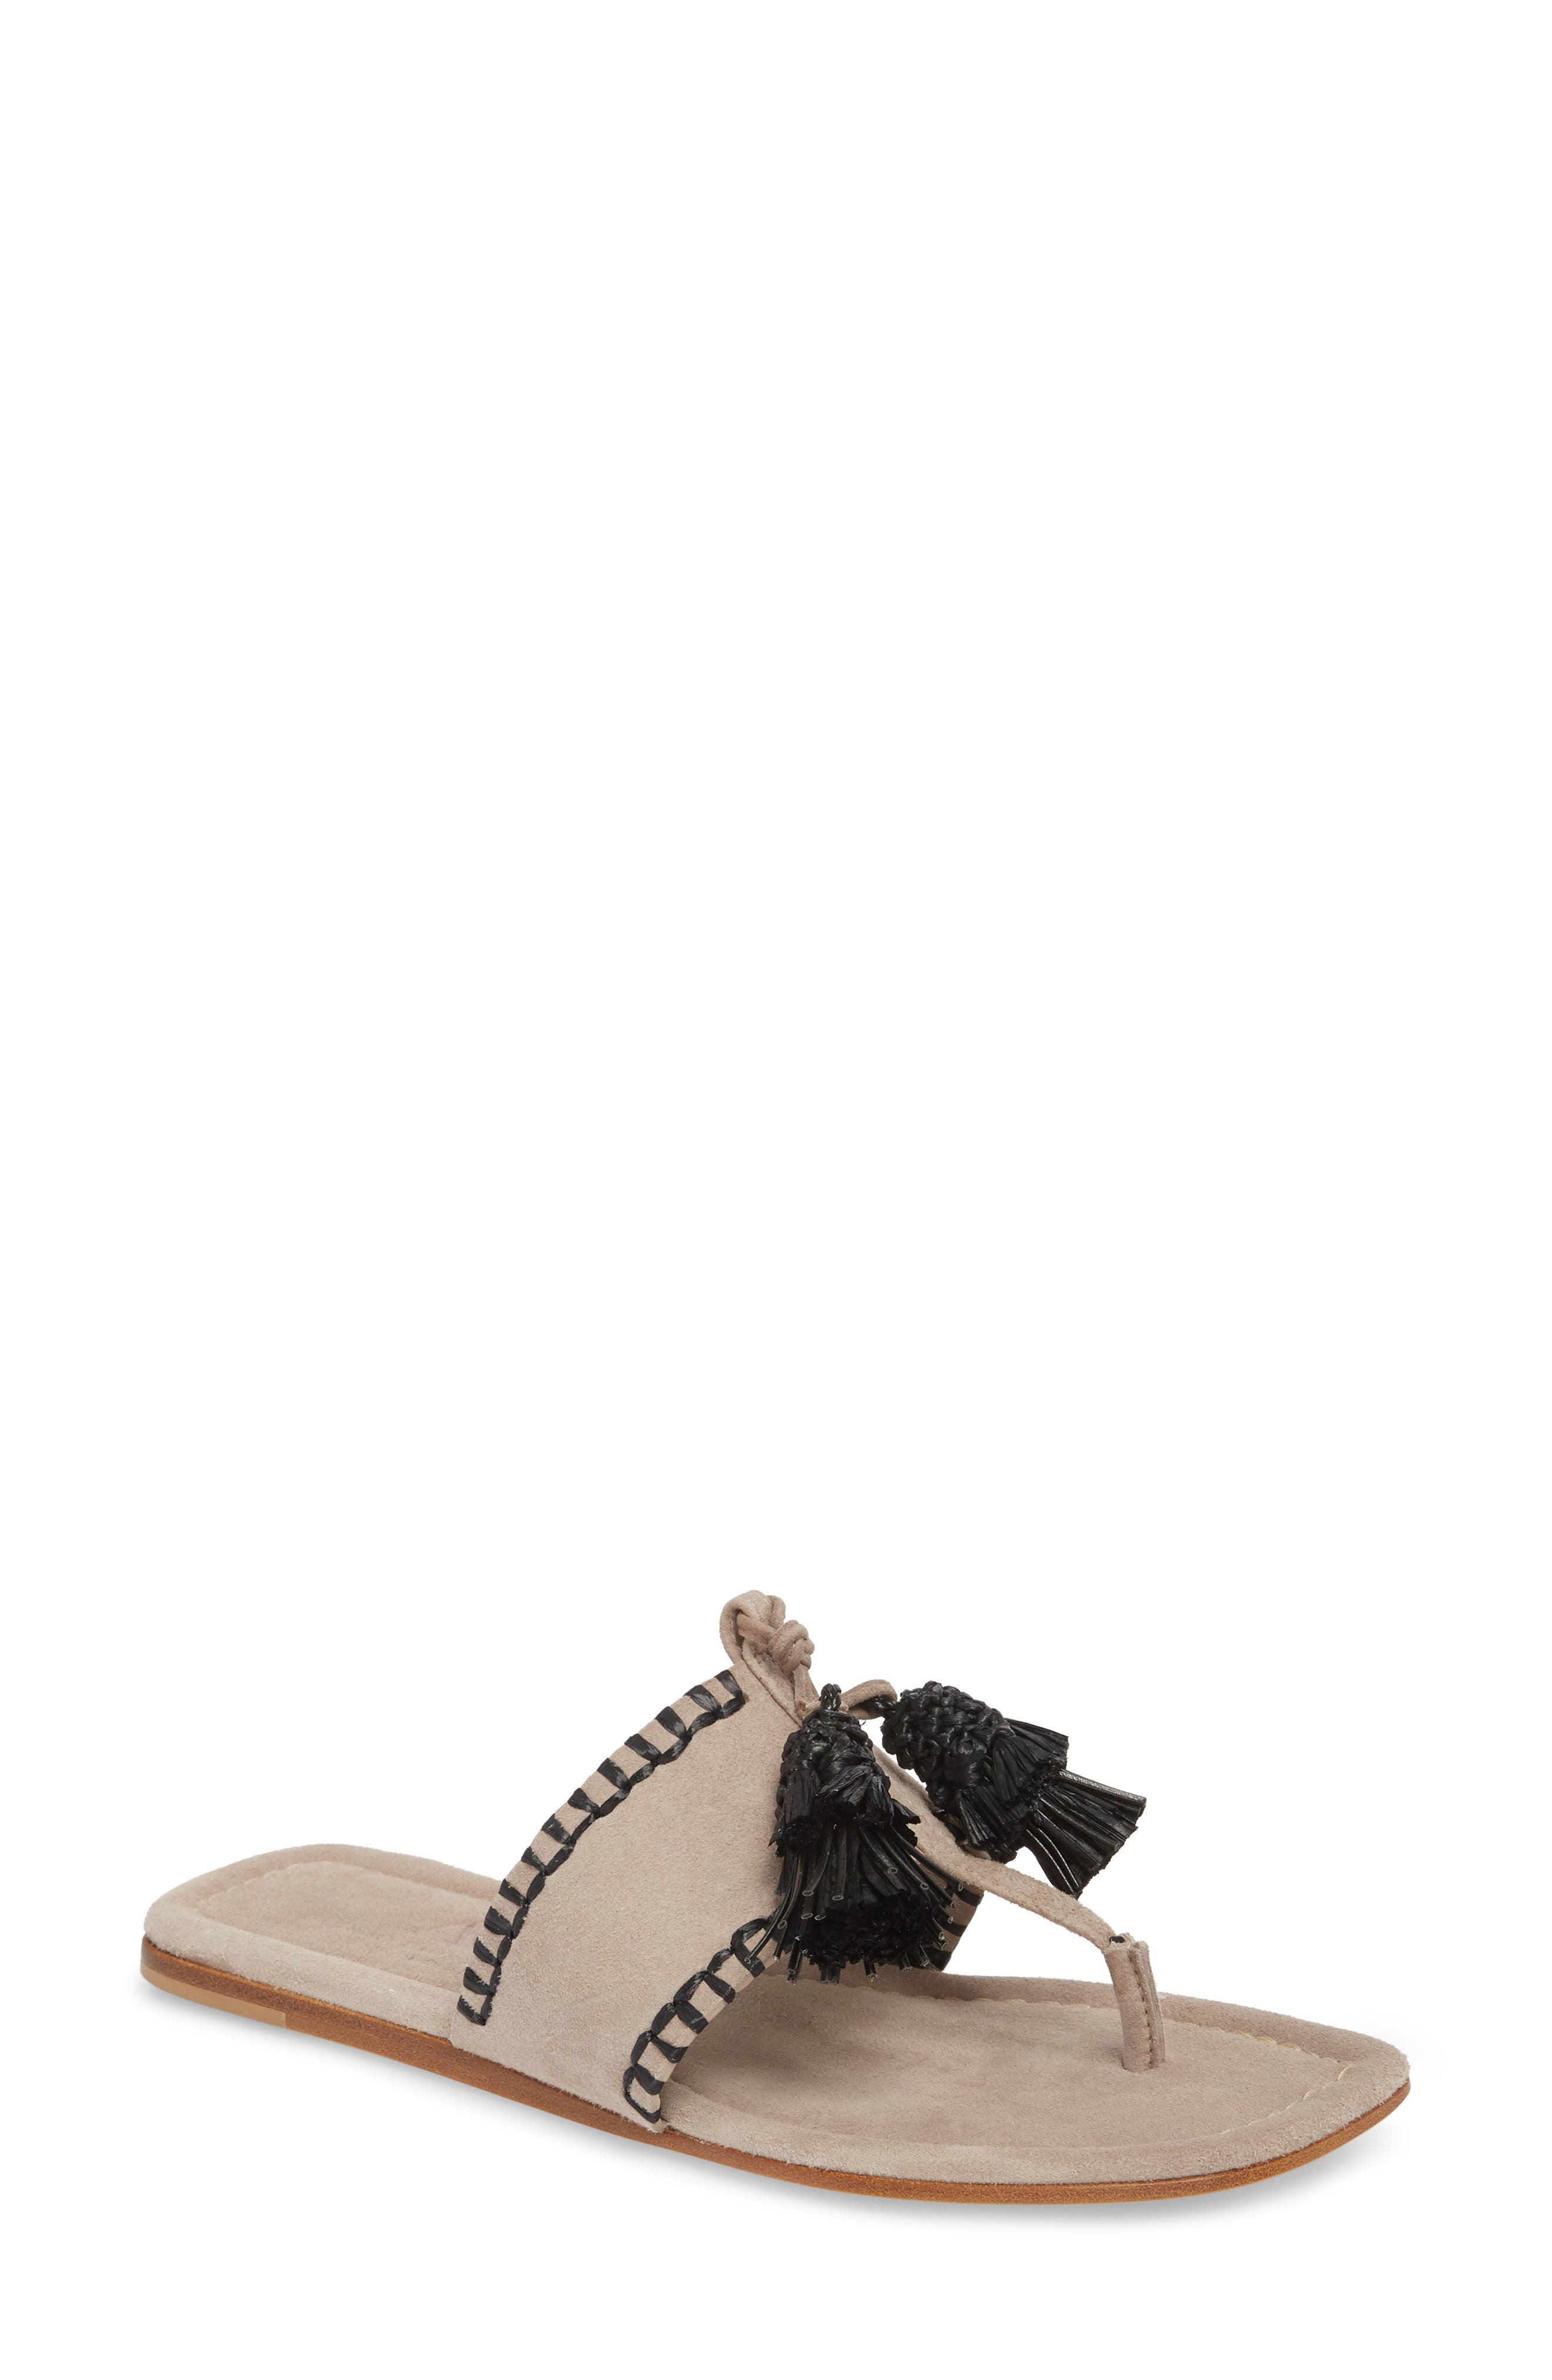 Raffia Tassel Sandal,                         Main,                         color, 020